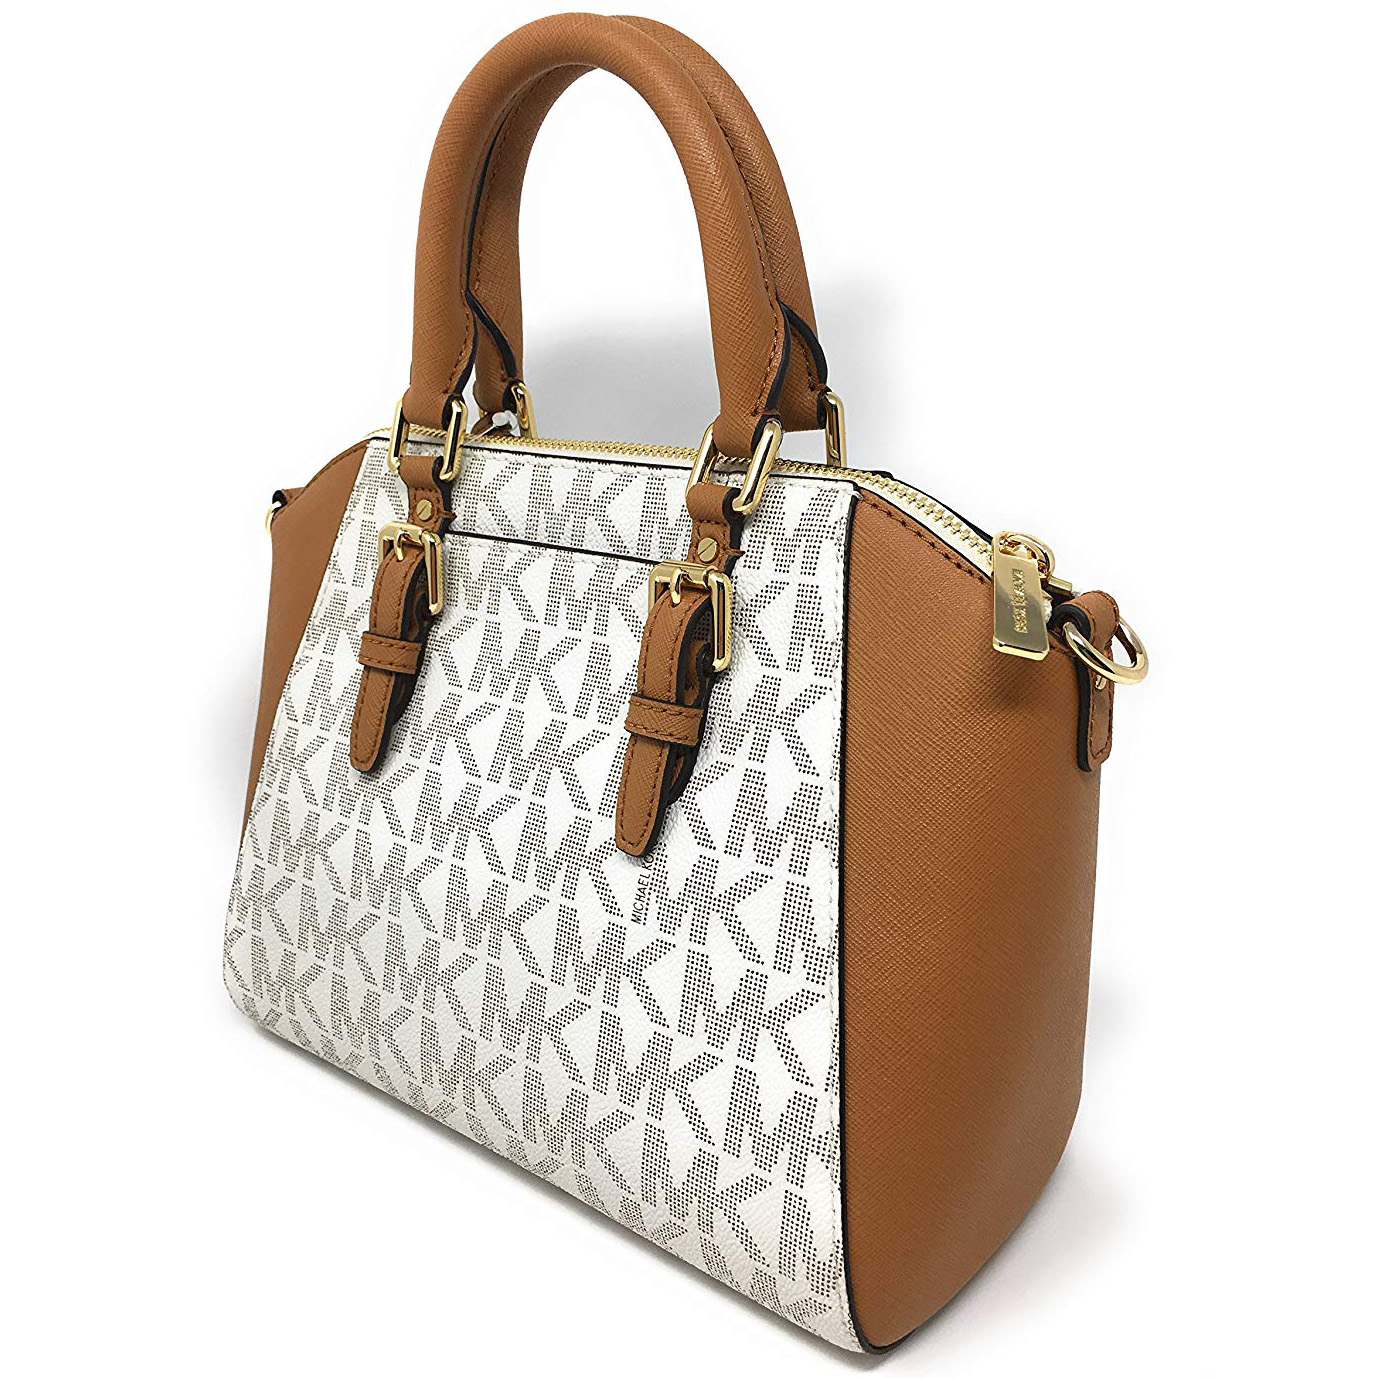 6096fc172a9d Michael Kors Ciara Medium Messenger Satchel Crossbody Bag Vanilla White    Acorn Brown   35S7GC6M8B